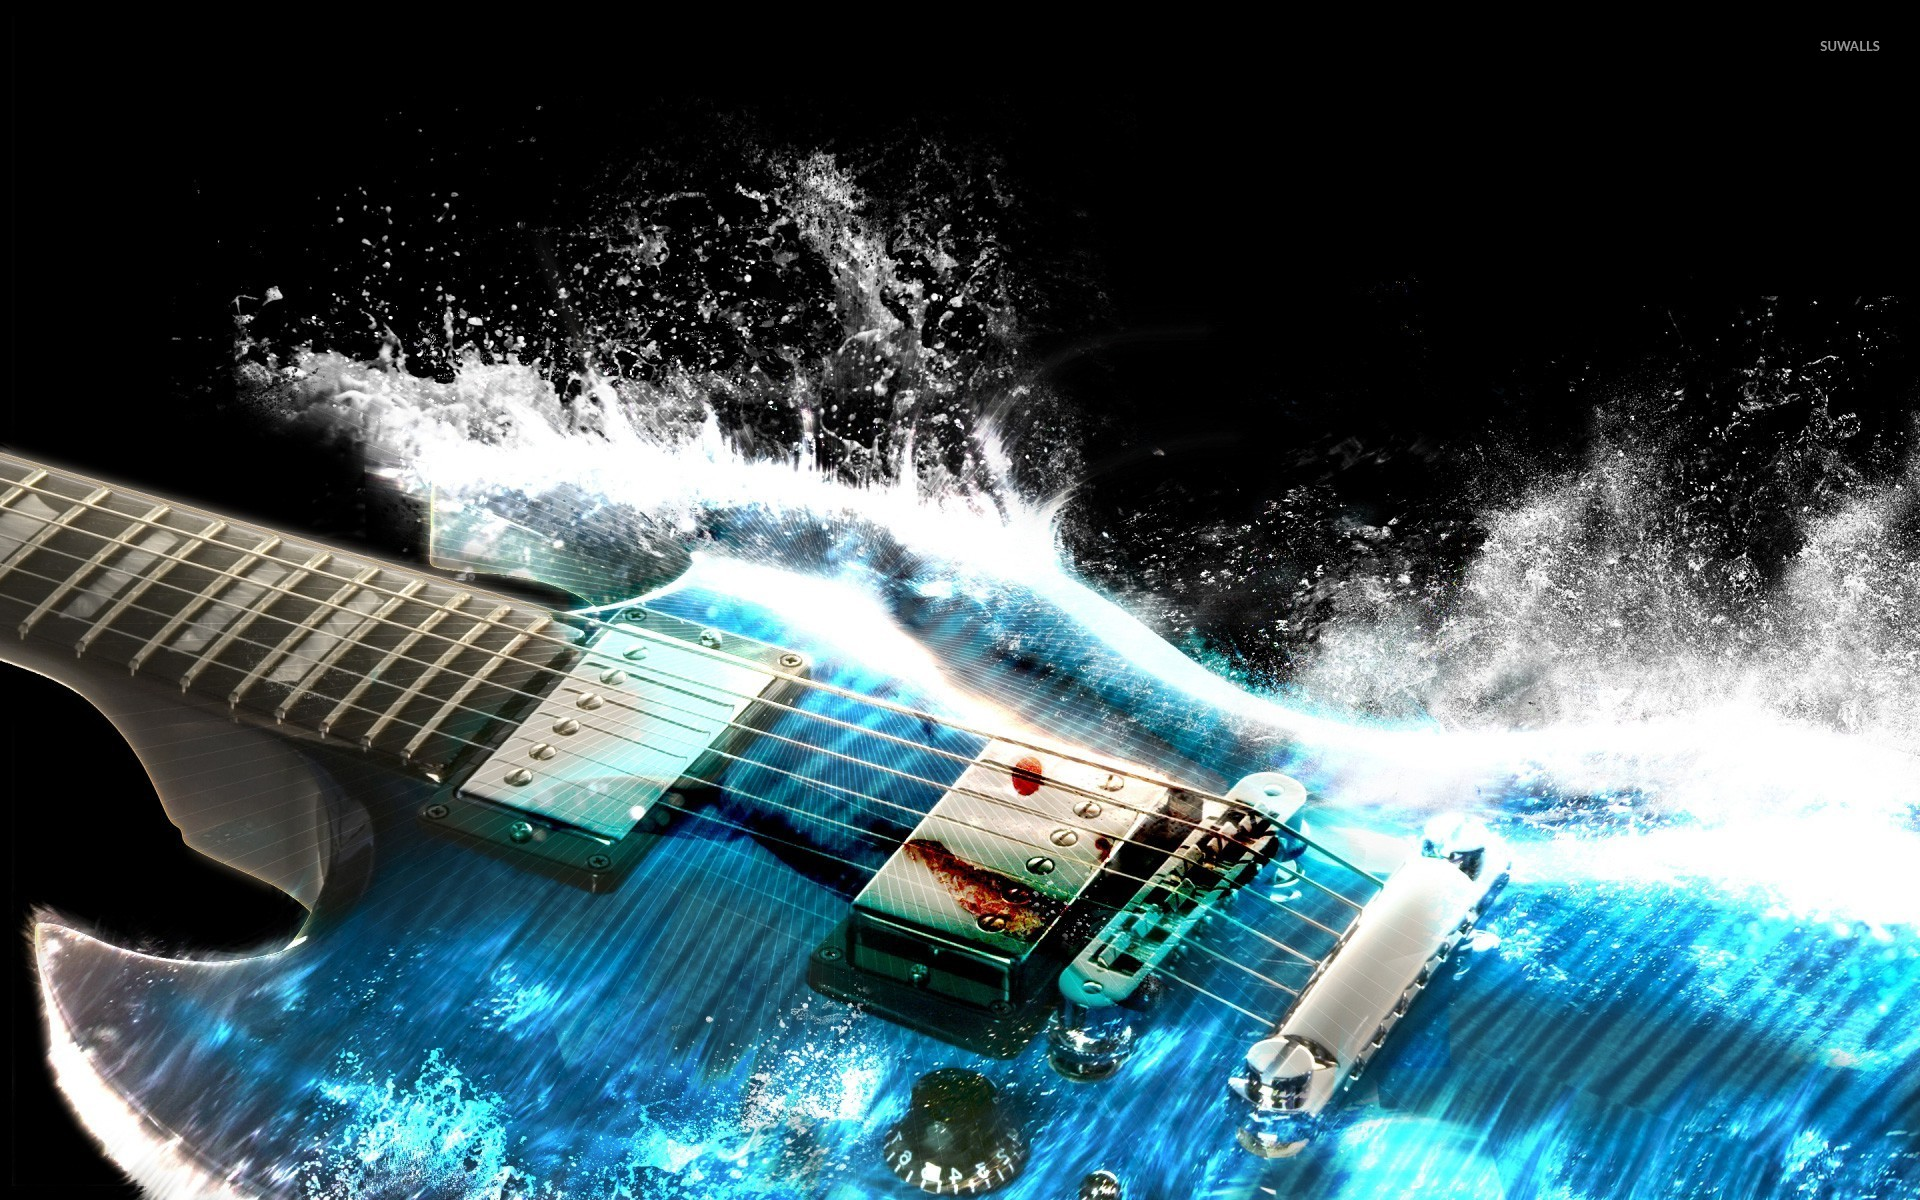 water-guitar-25234-1920x1200.jpg